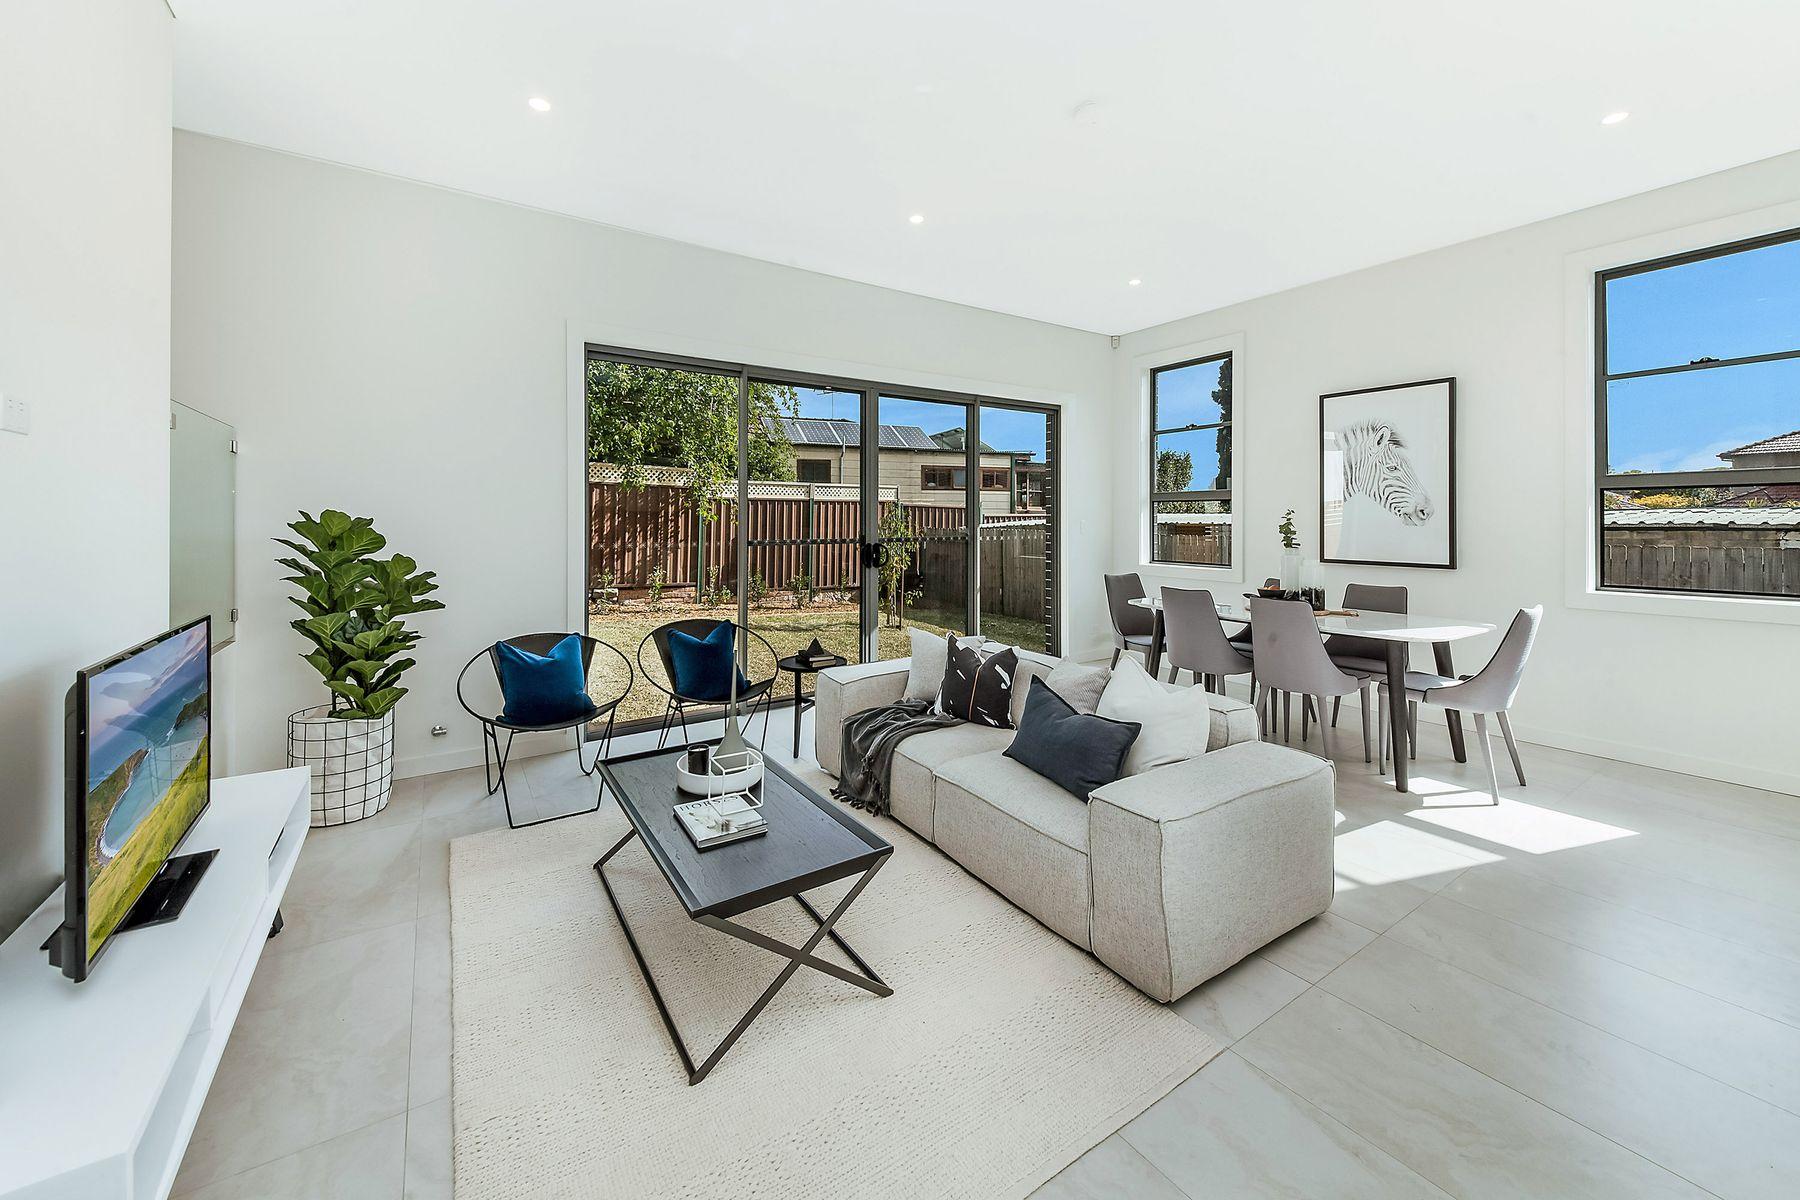 106 Pittwater Road, Gladesville, NSW 2111